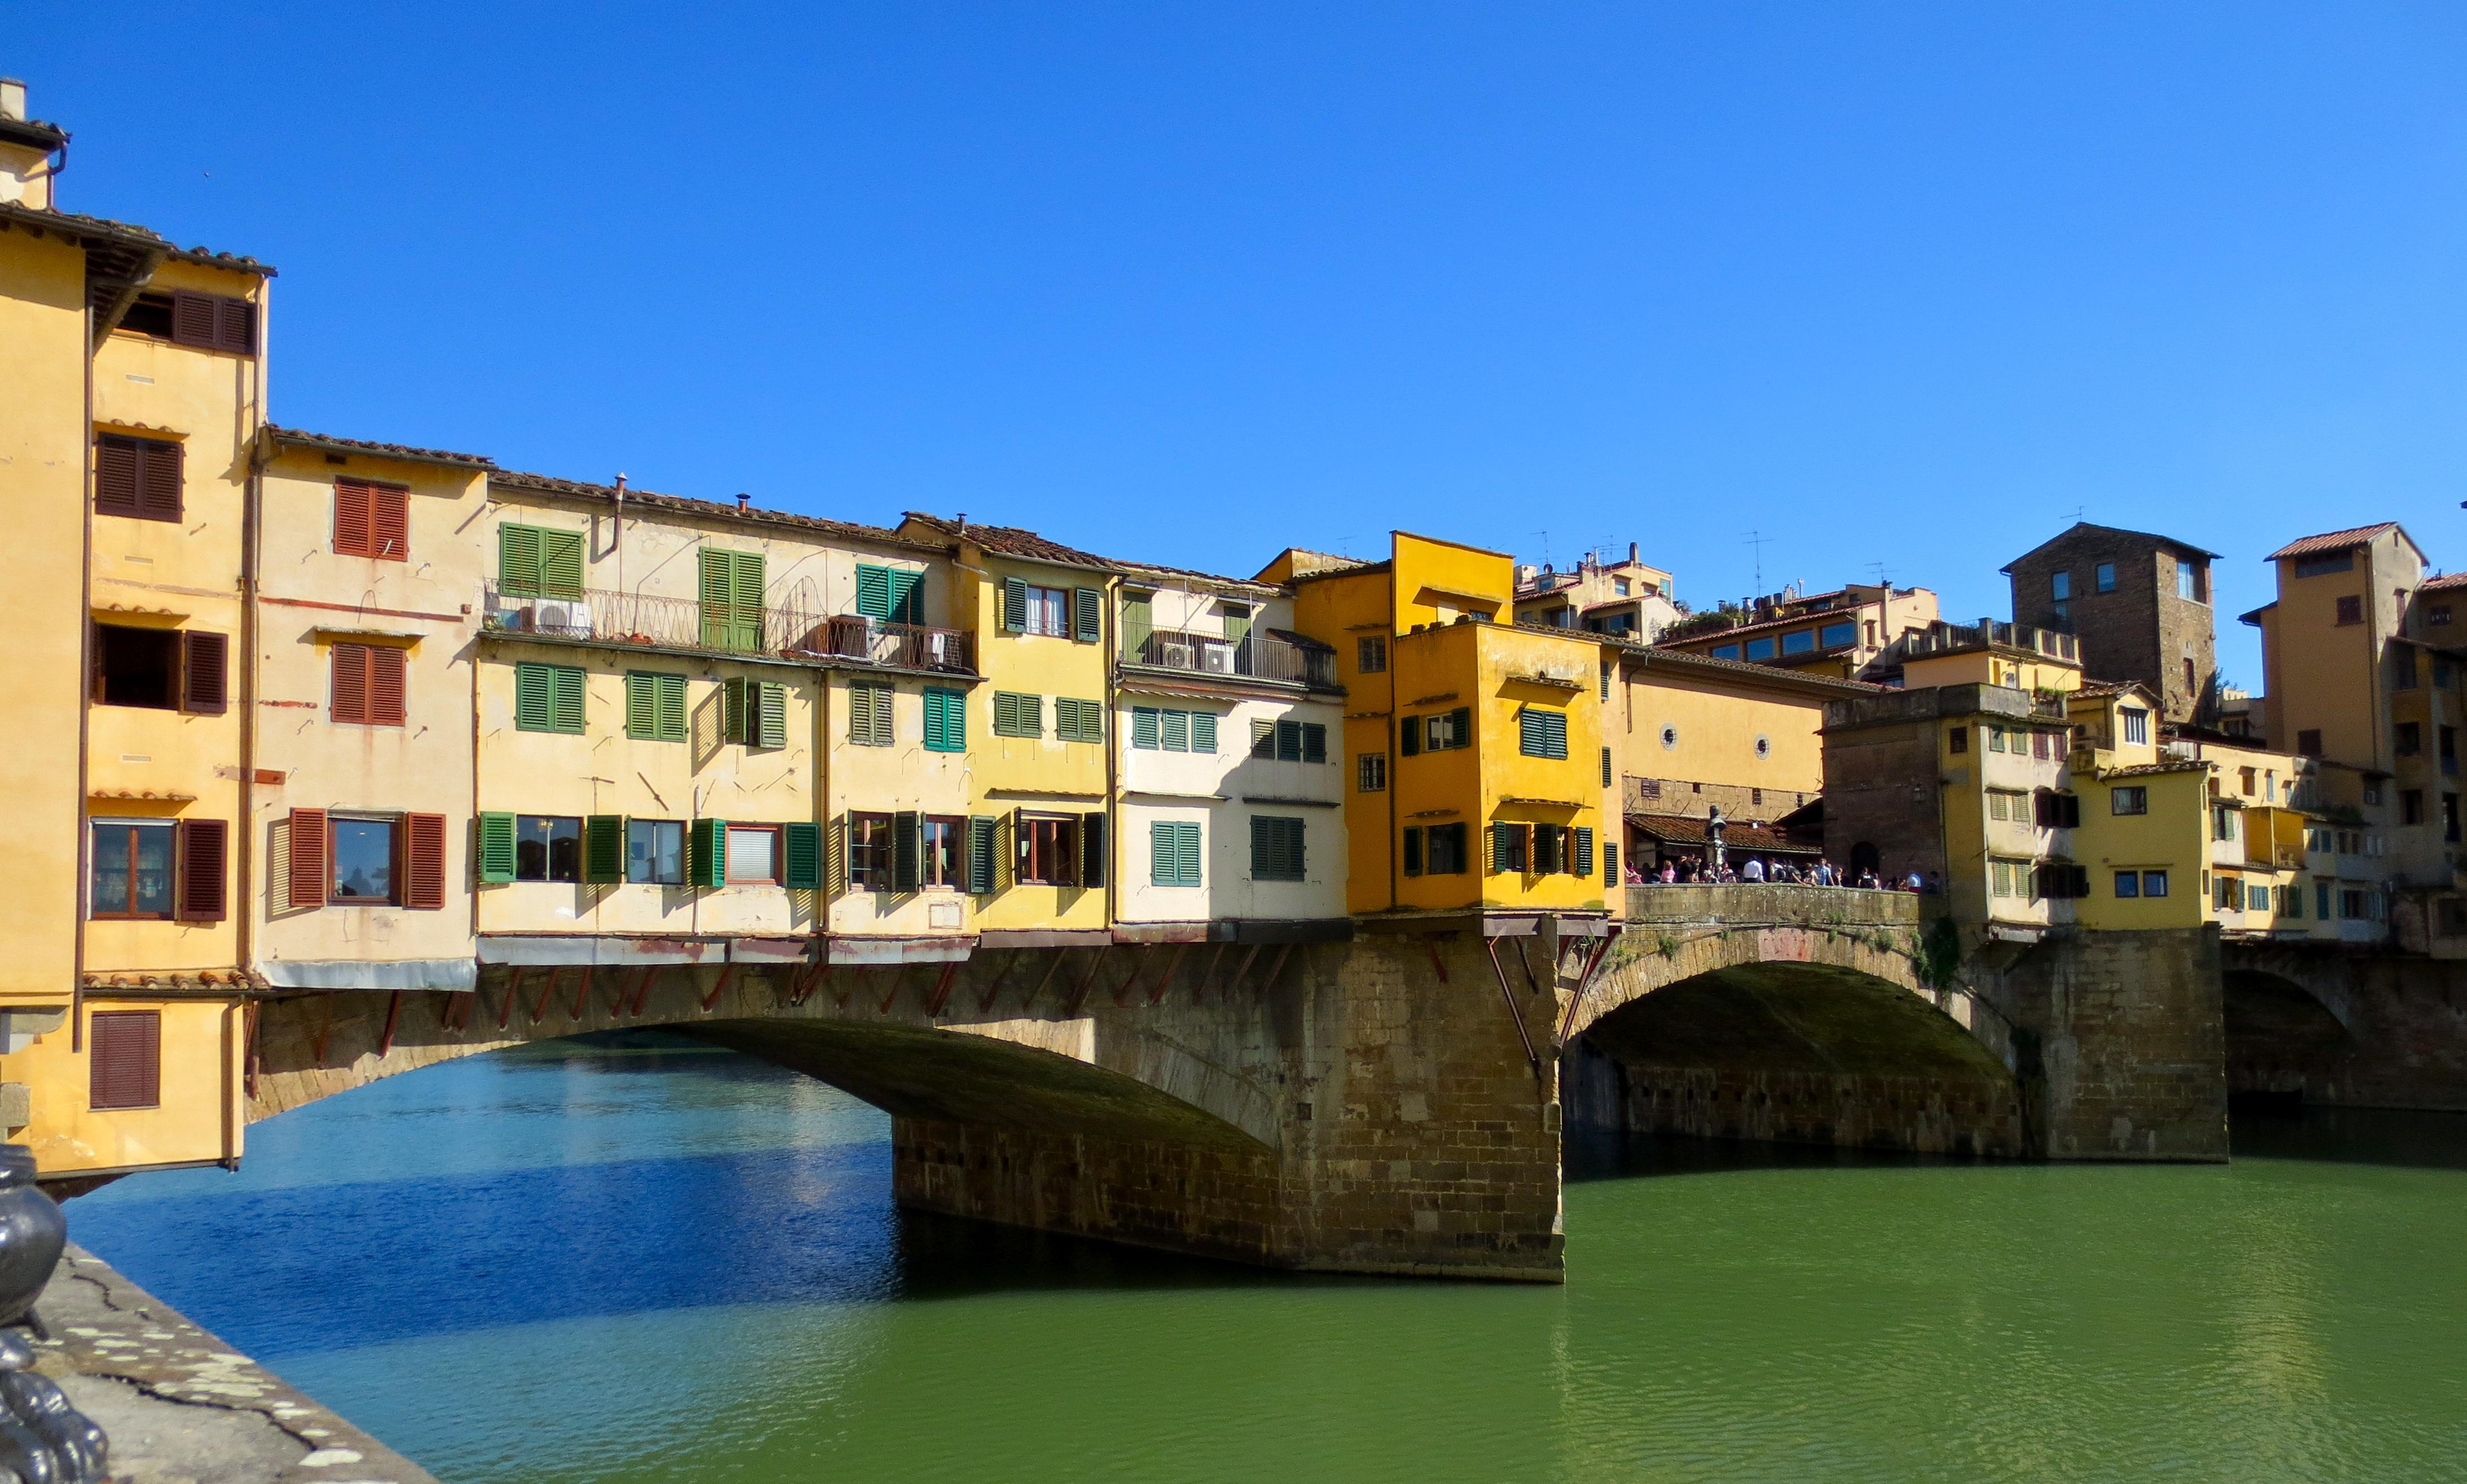 Bellissimo Ponte Vecchio